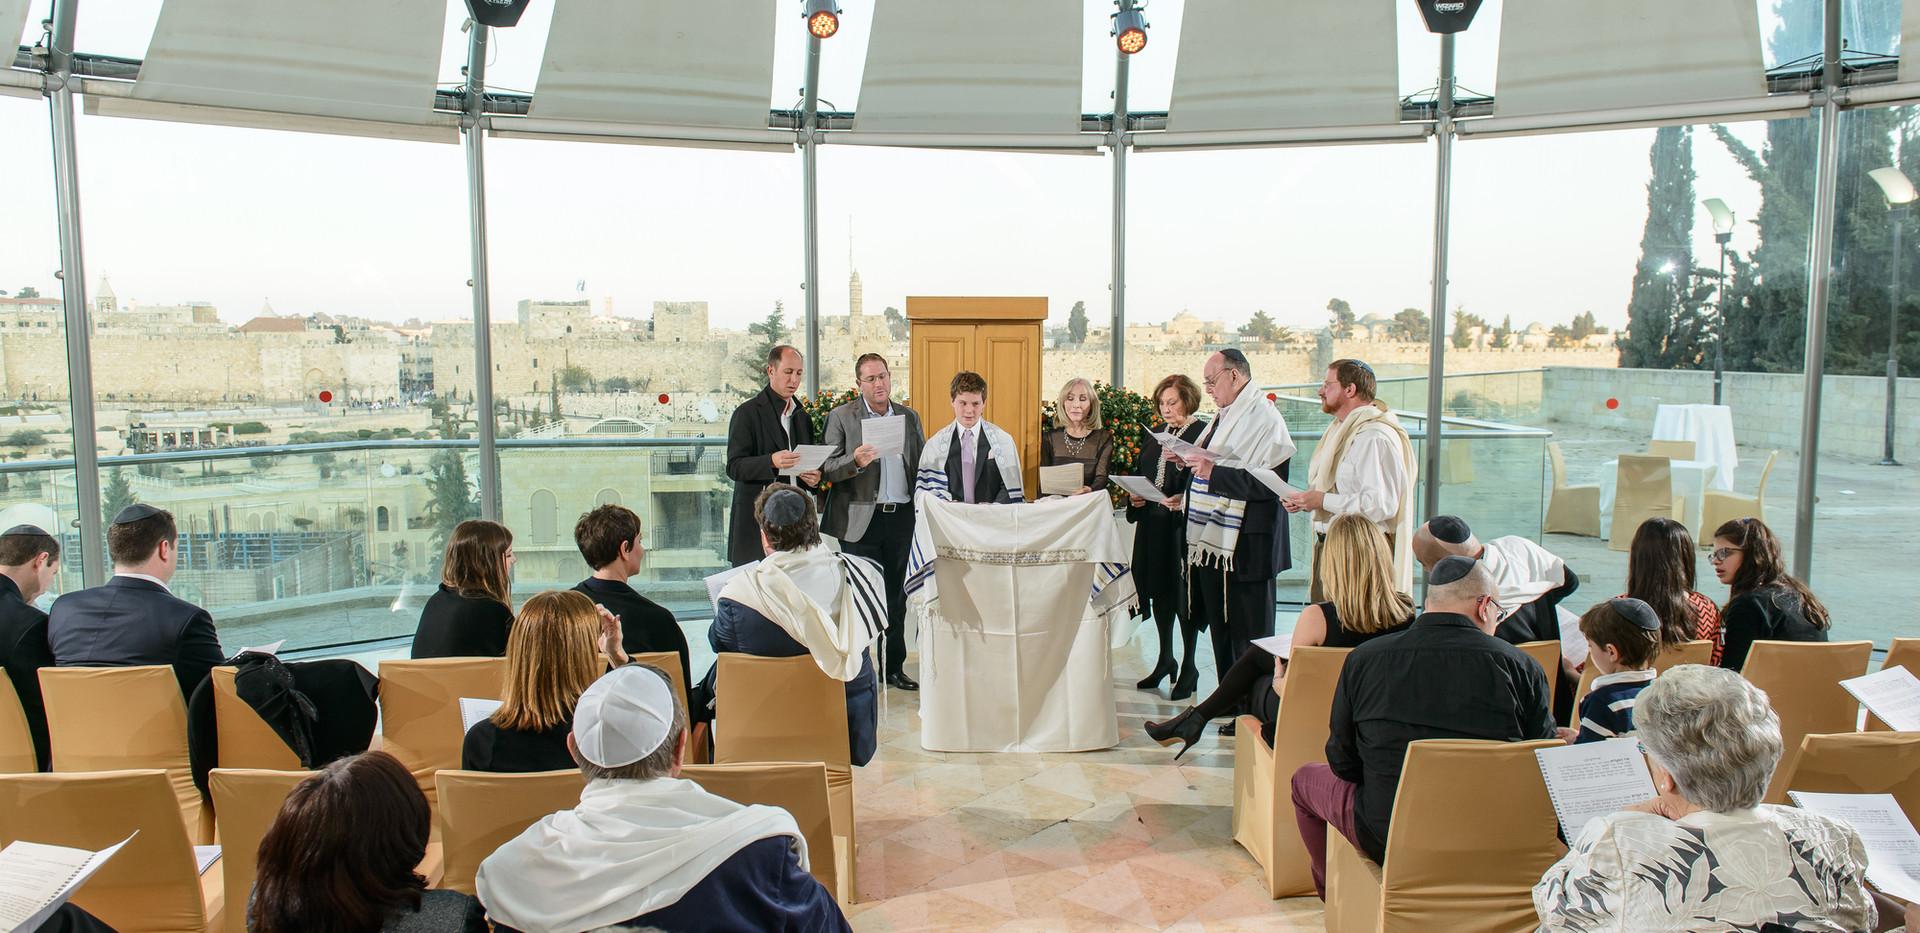 Bar Mitzvah Ceremony at Beit Shmuel